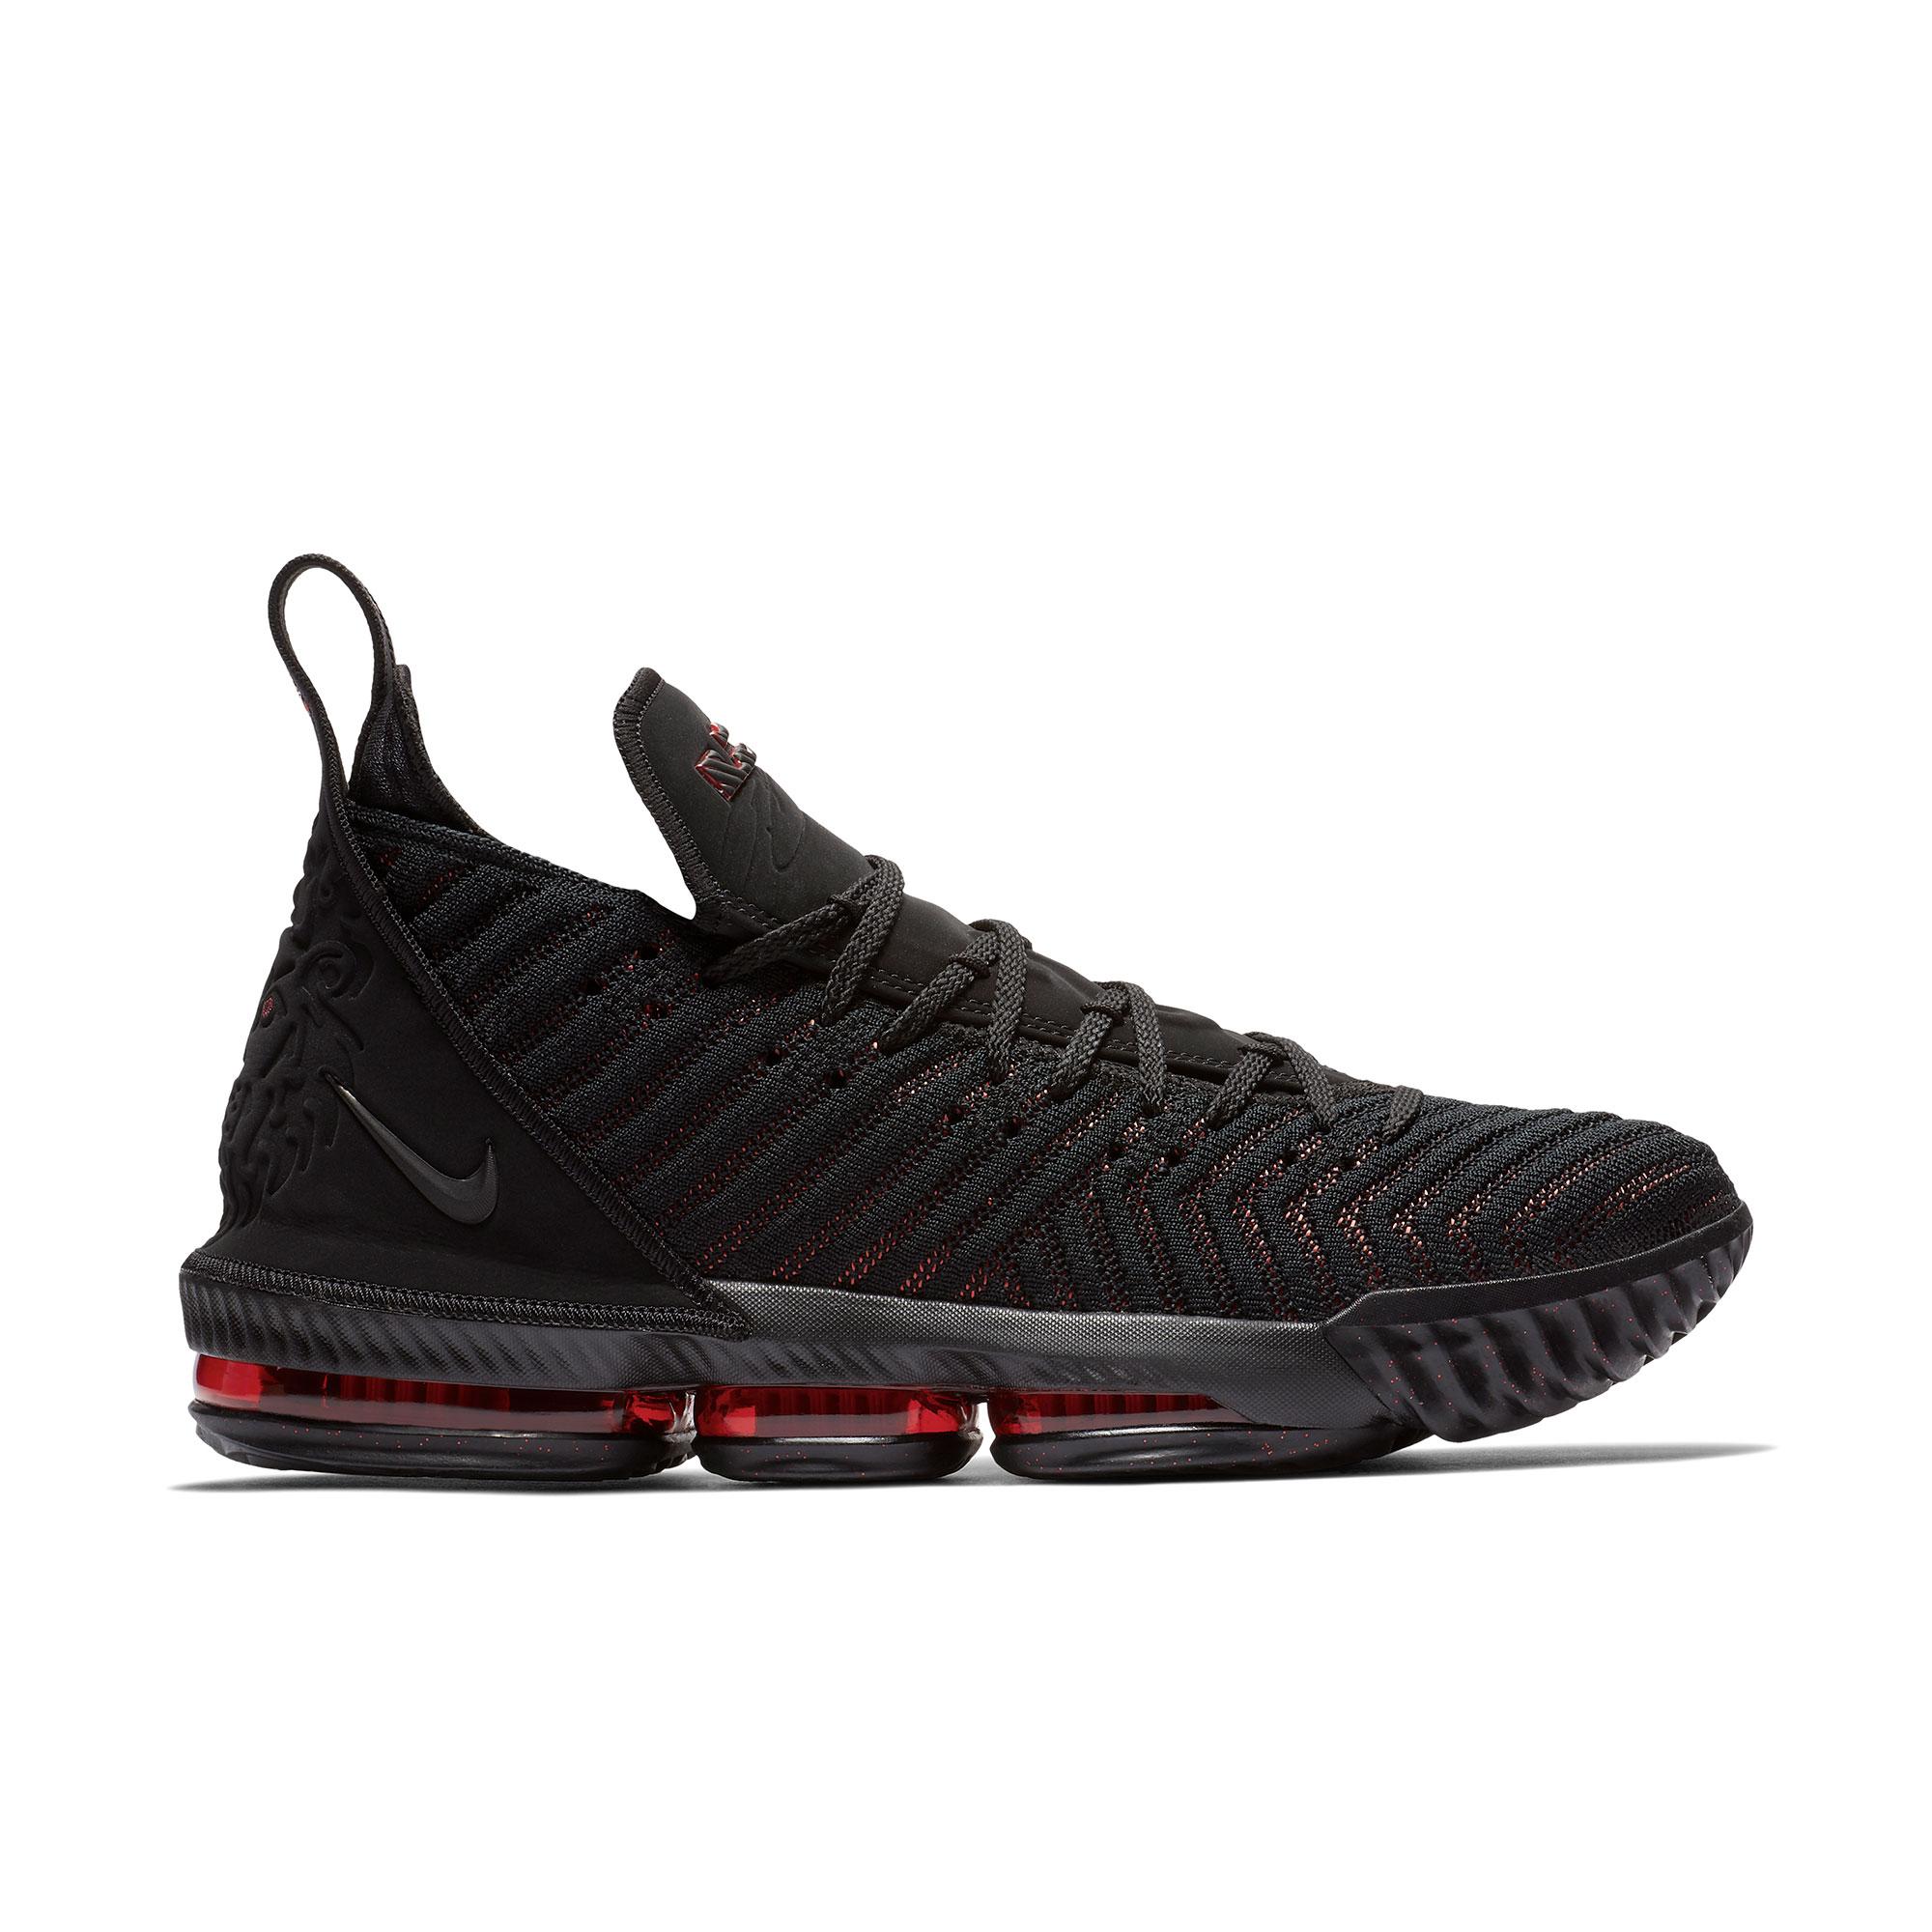 Nike LeBron 16 Basketball Release